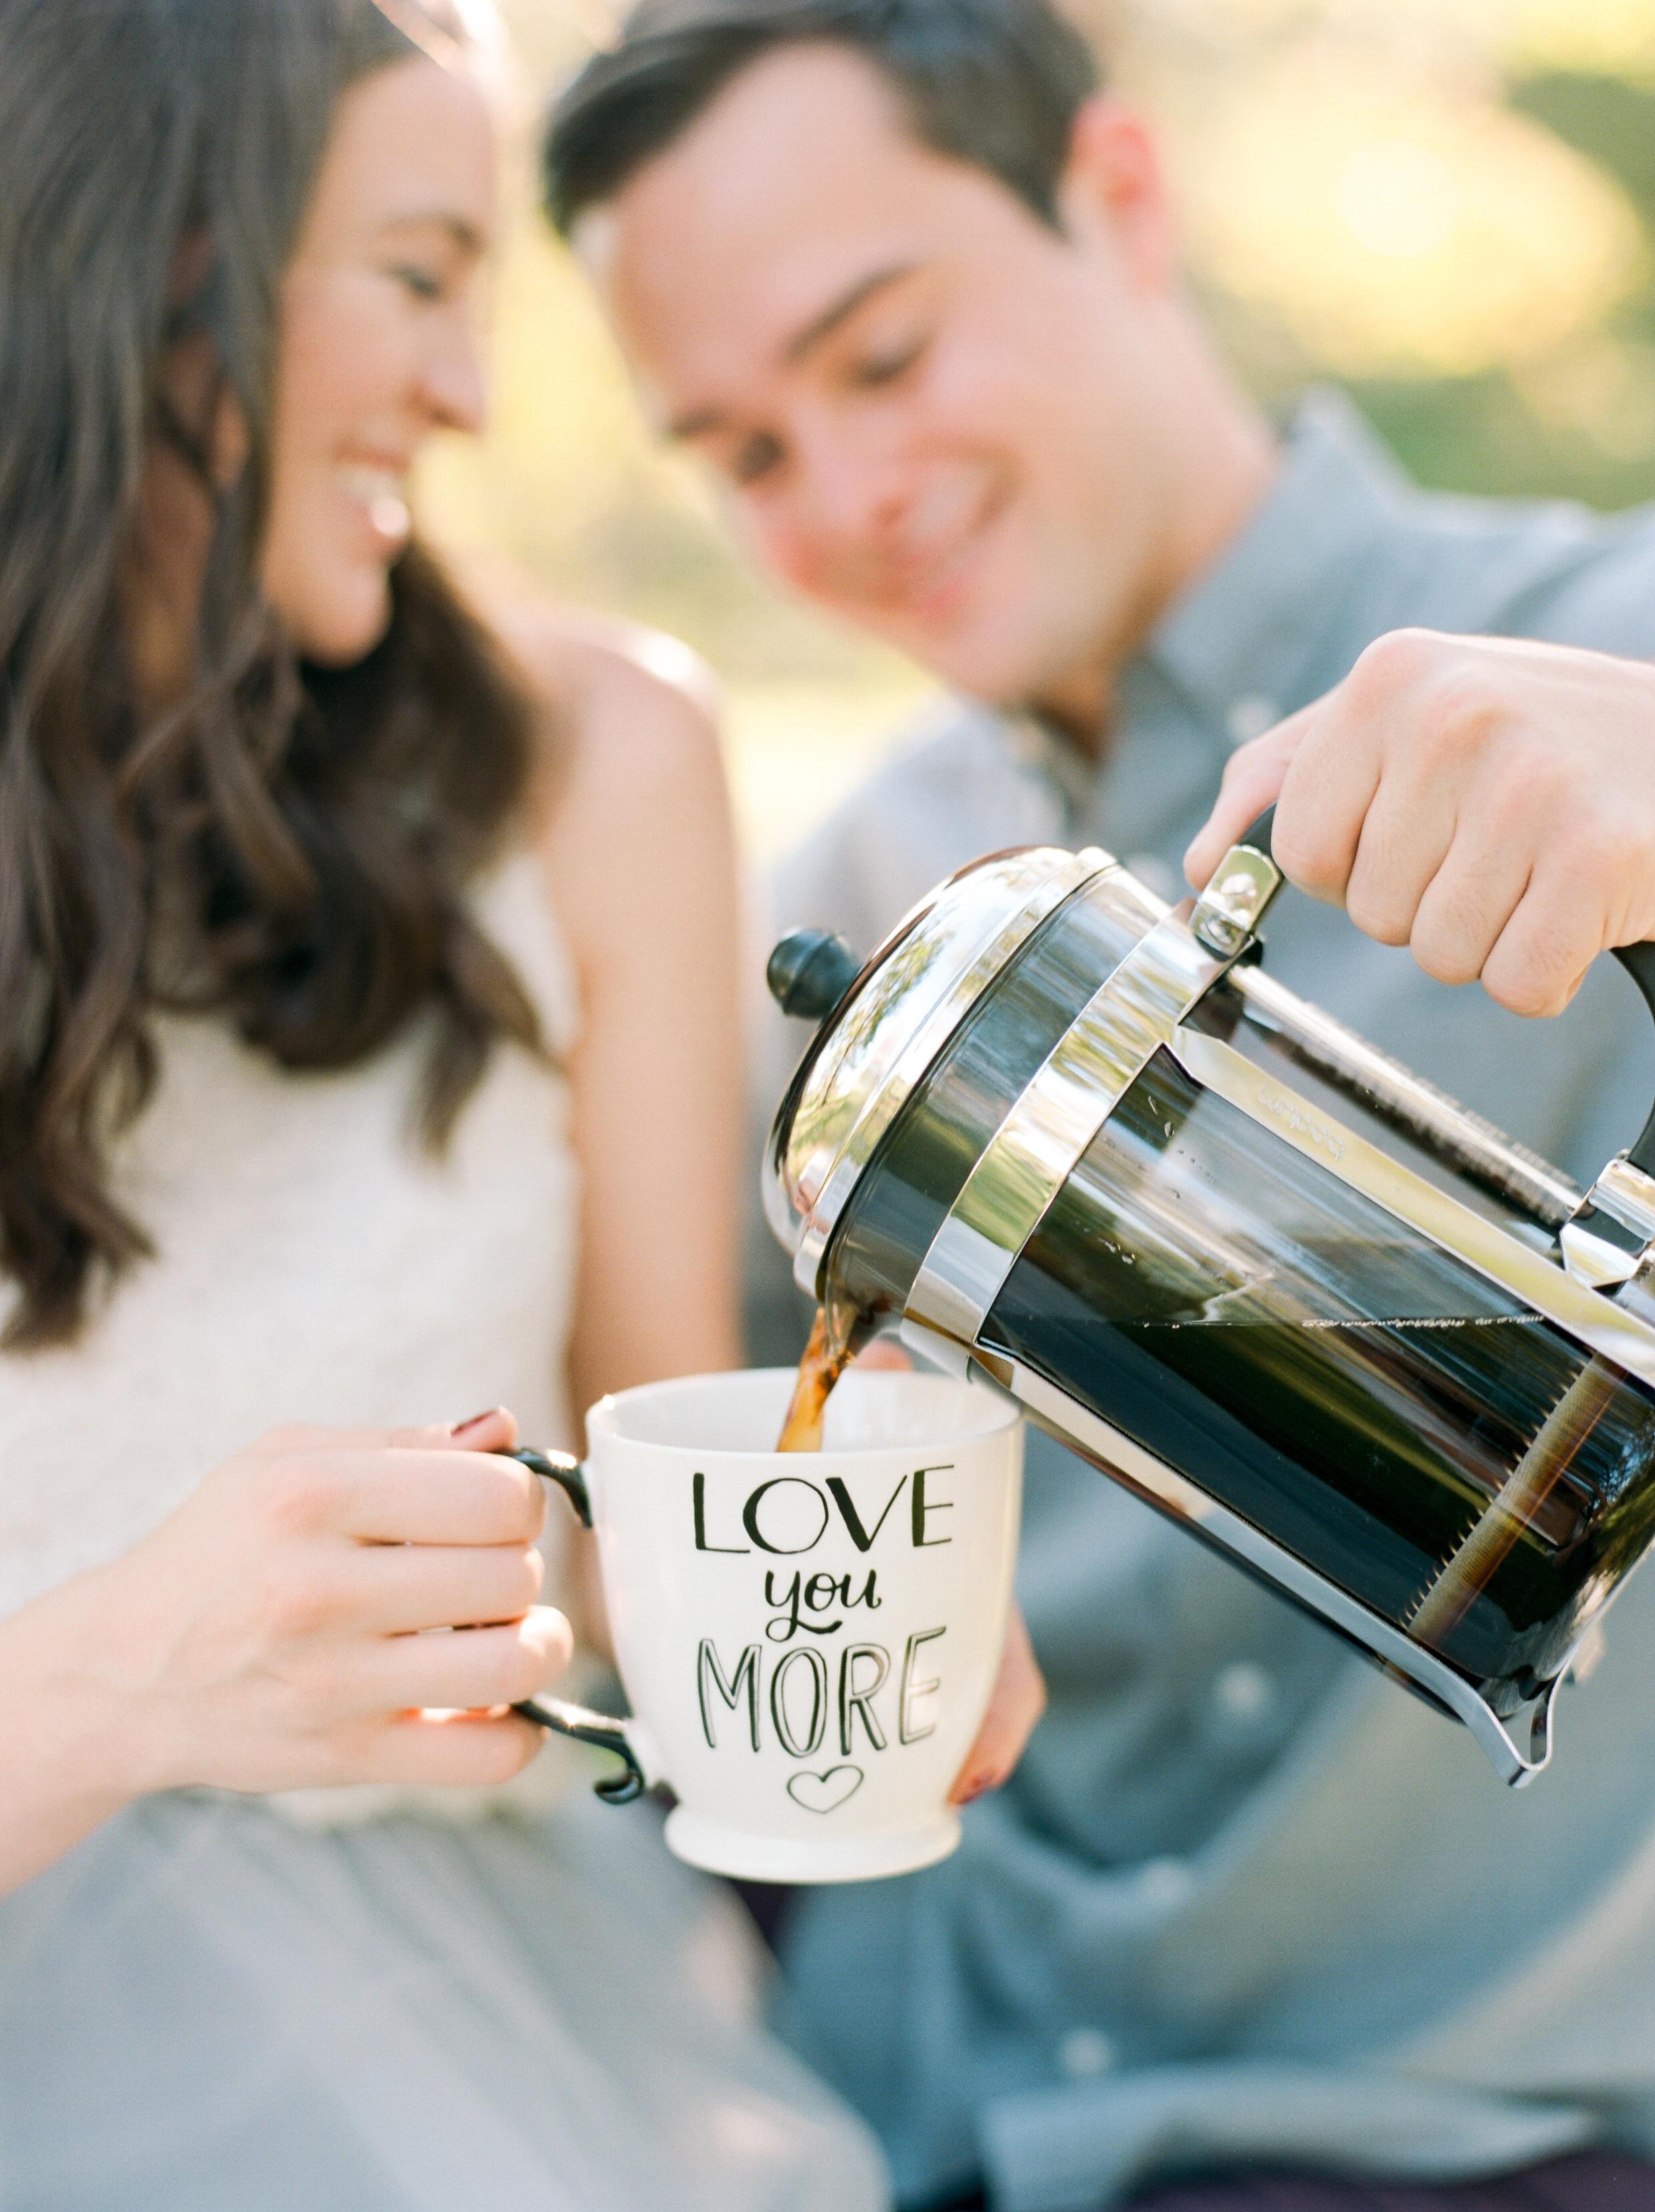 houston-wedding-photographer-college-station-austin-the-woodlands-film-photography-style-me-pretty-engagements-dana-fernandez-photography-8.jpg